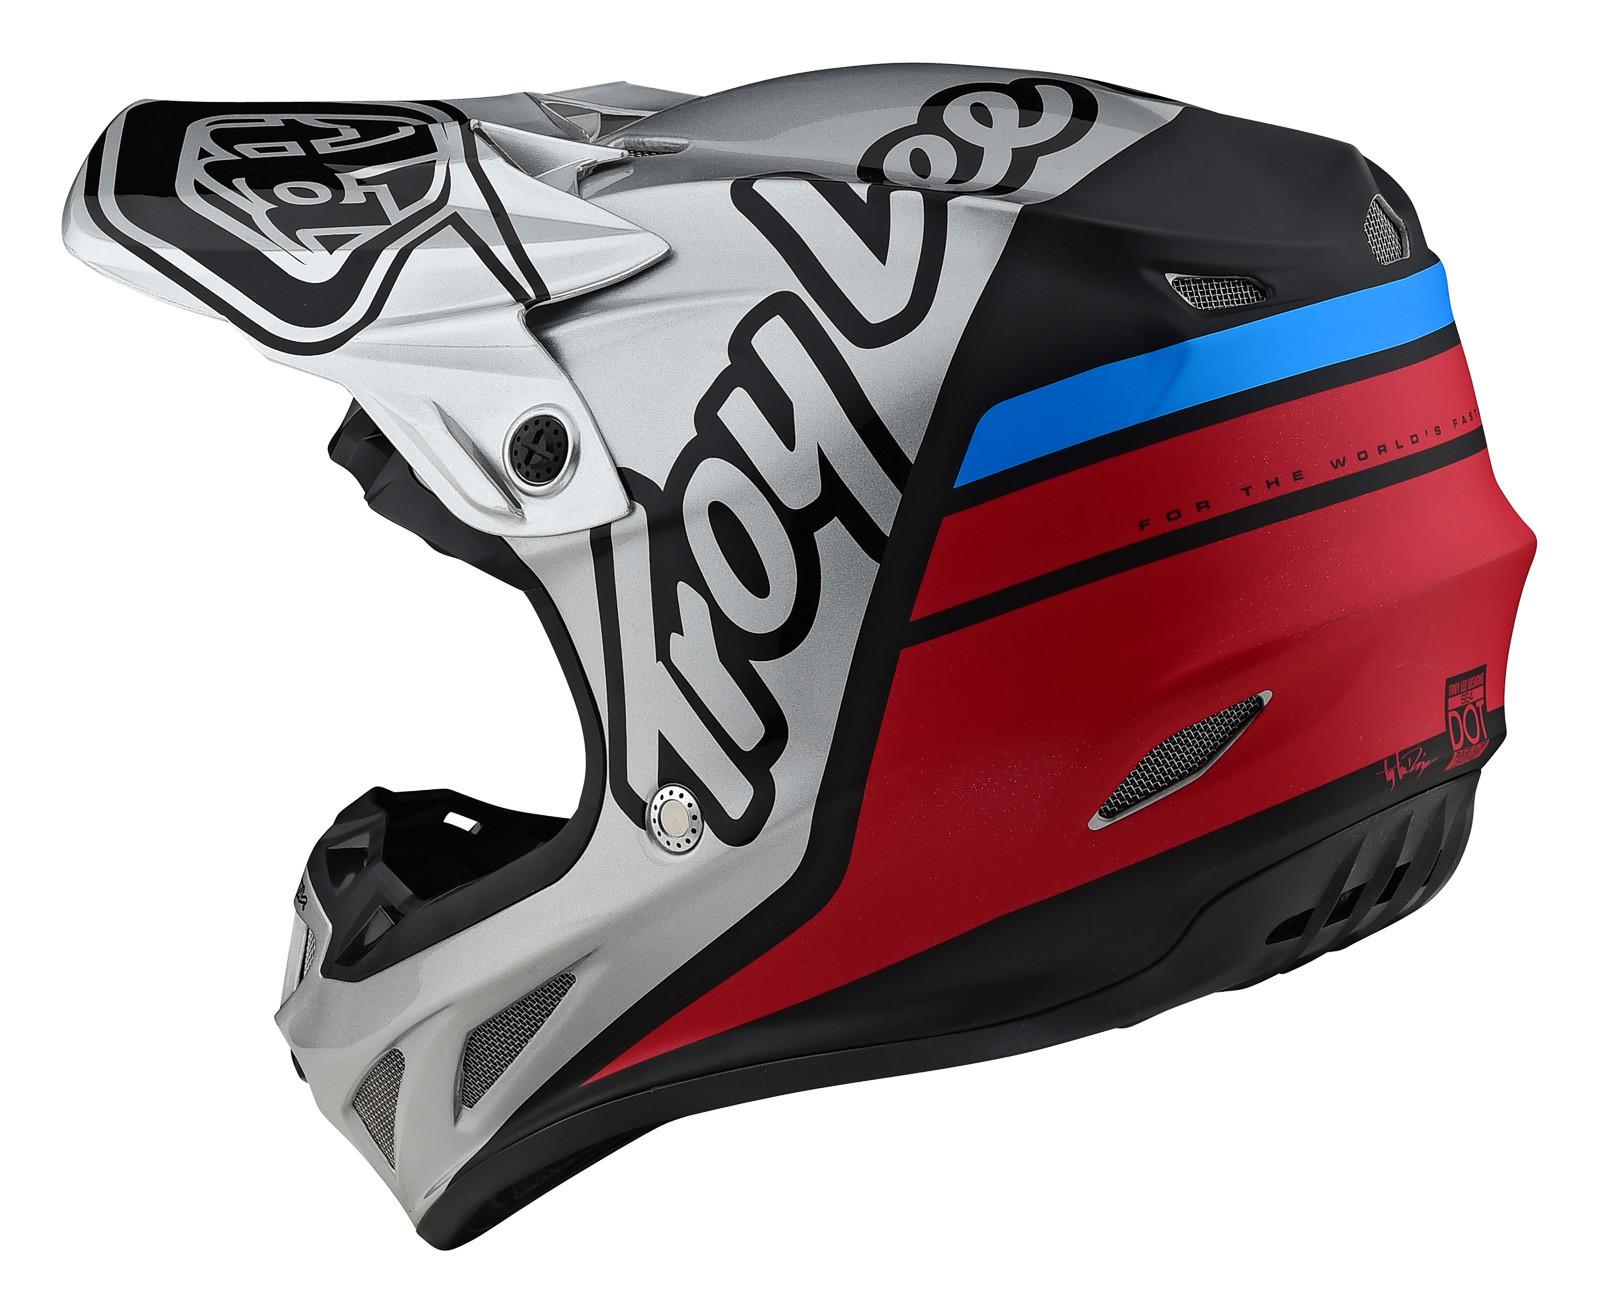 Troy Lee Designs SE4 Composite helmet.